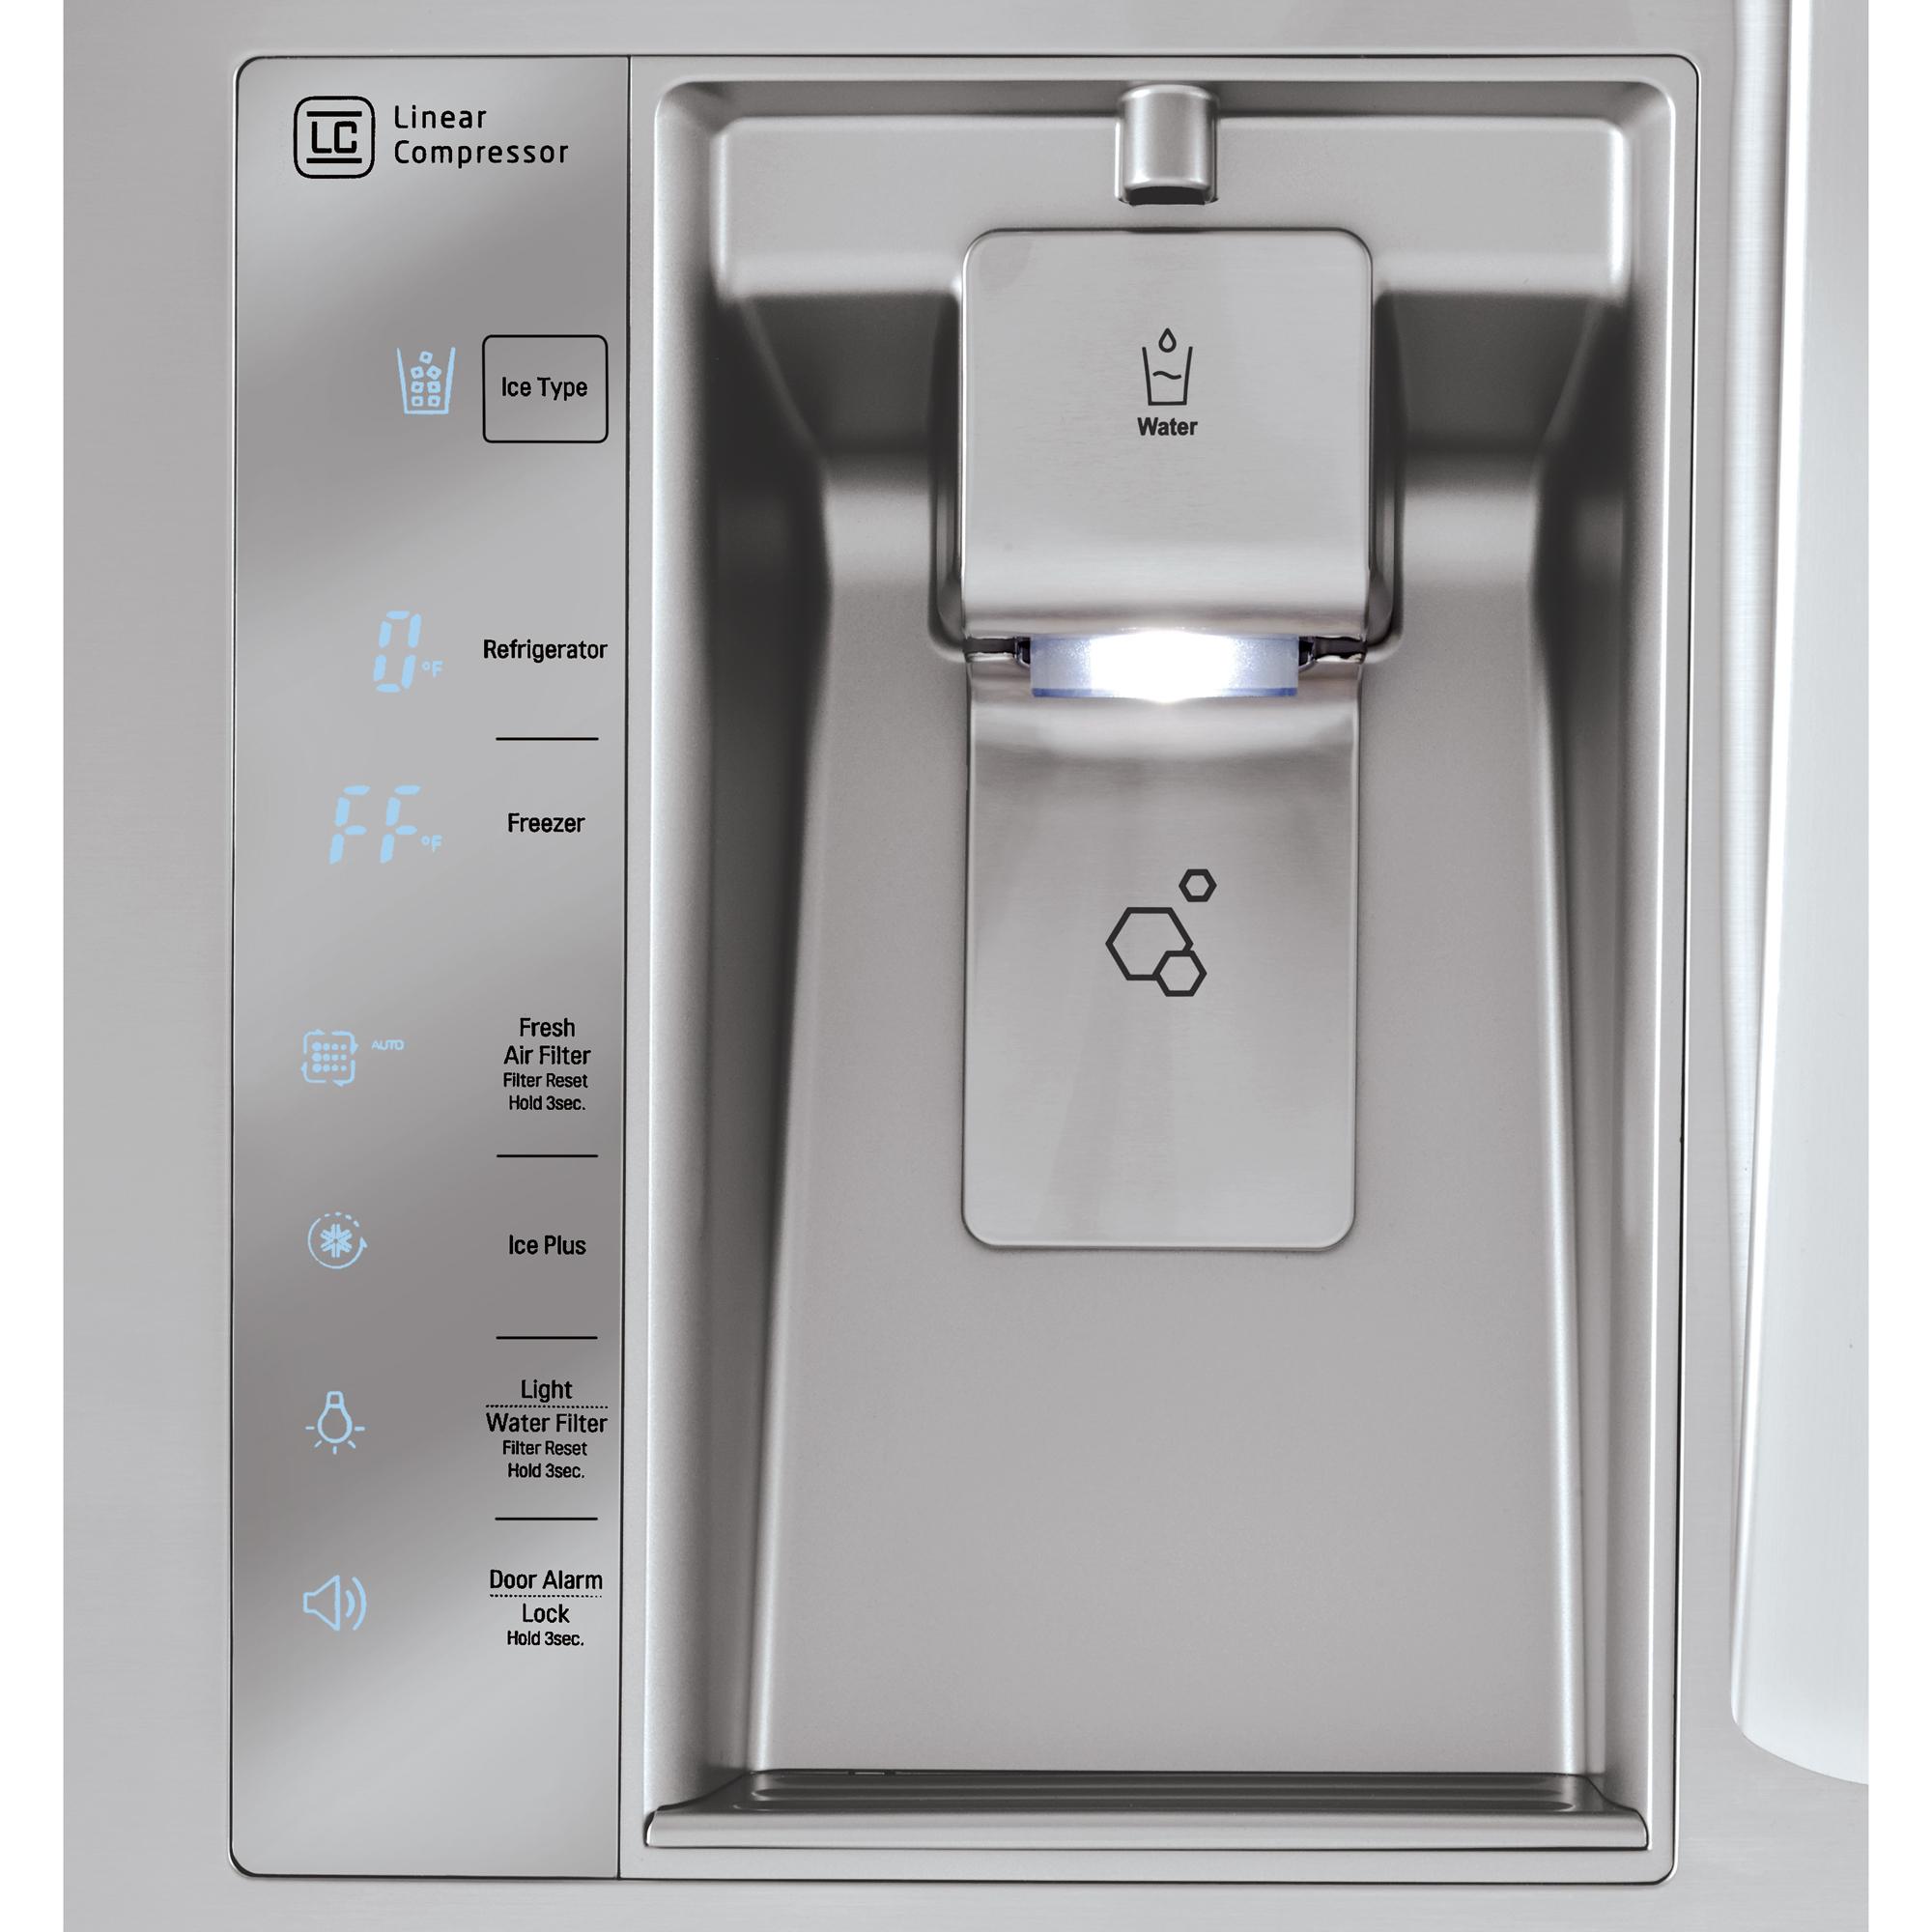 LG LMXC23746S 22.7 cu.ft. Counter-Depth 4-Door Refrigerator w/ CustomChill™ Drawer - Stainless Steel